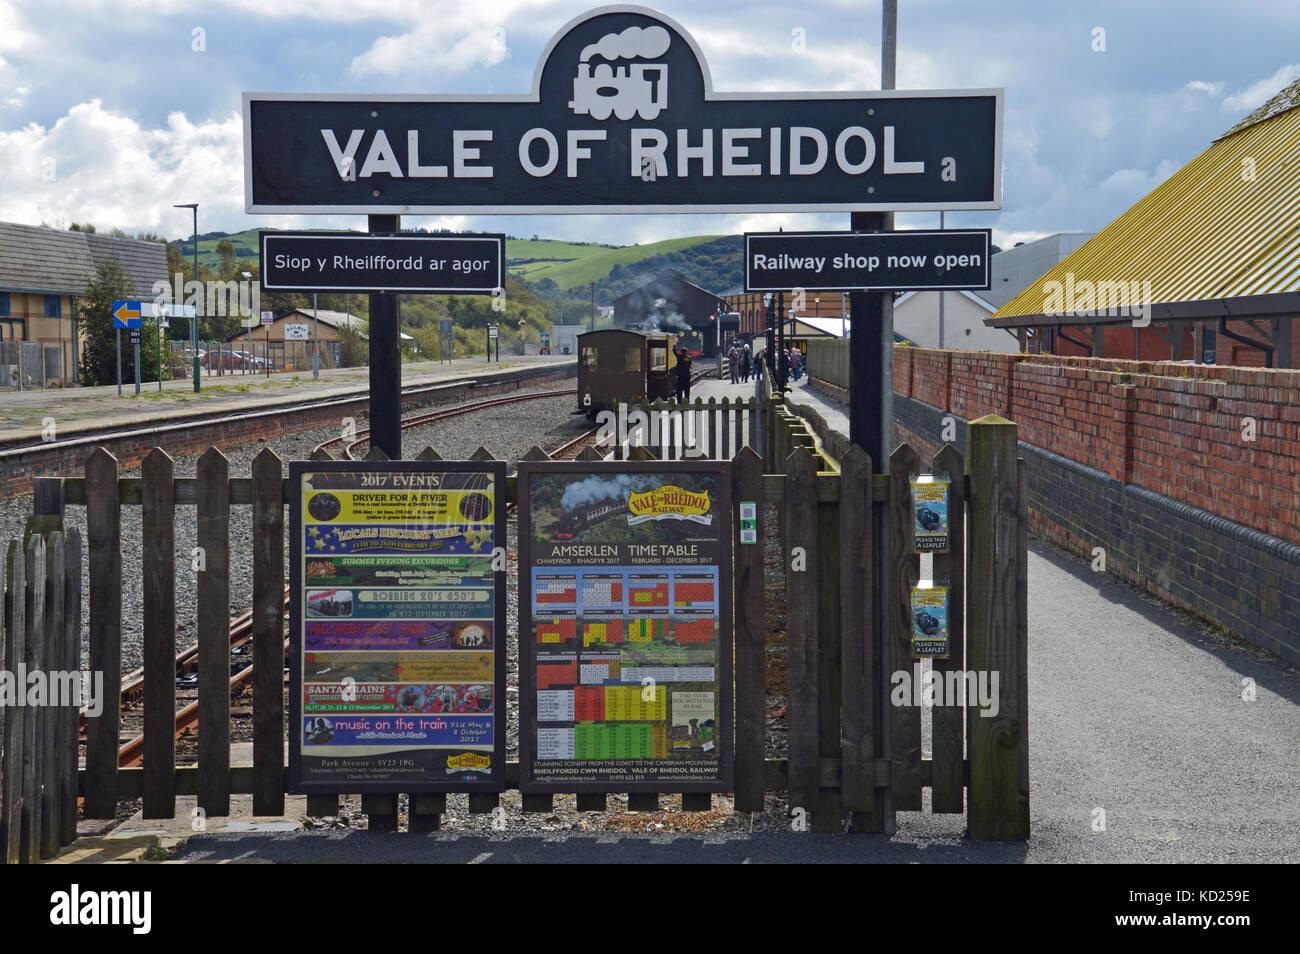 Vale of Rheidol Railway, Abersystwyth, Ceredigion, Wales - Stock Image